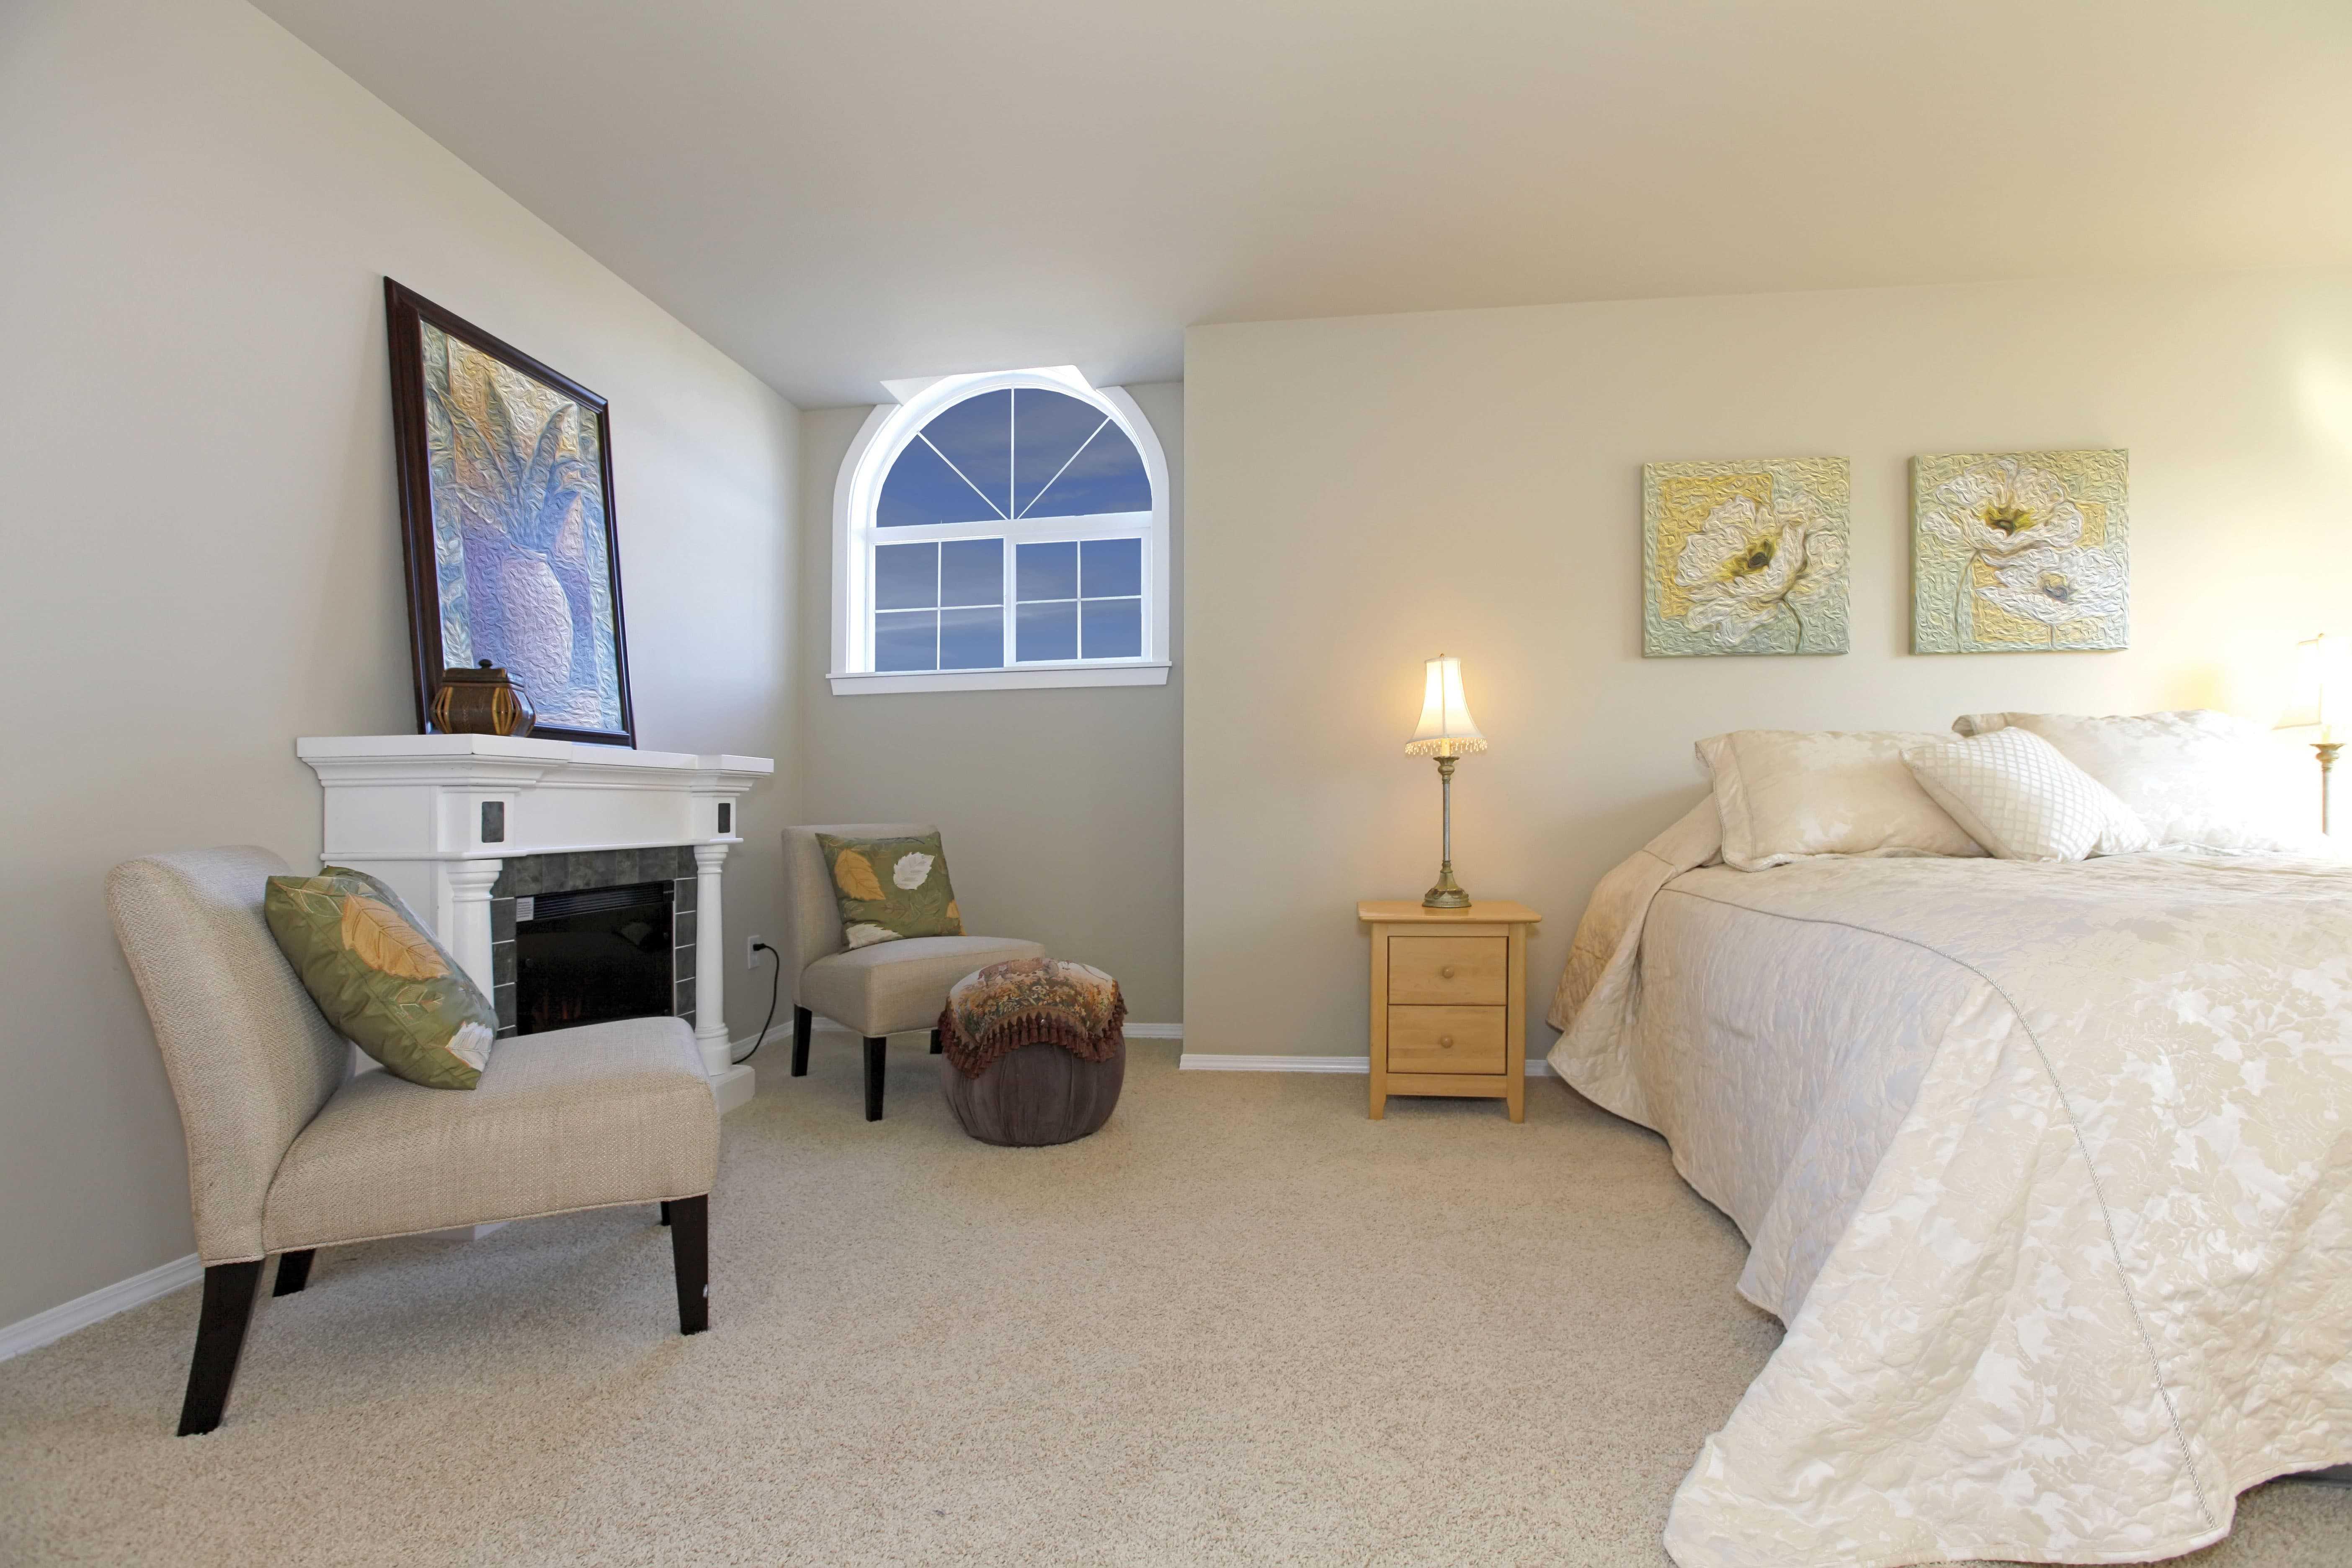 Ww 8000 Slider Bedroom As Lg